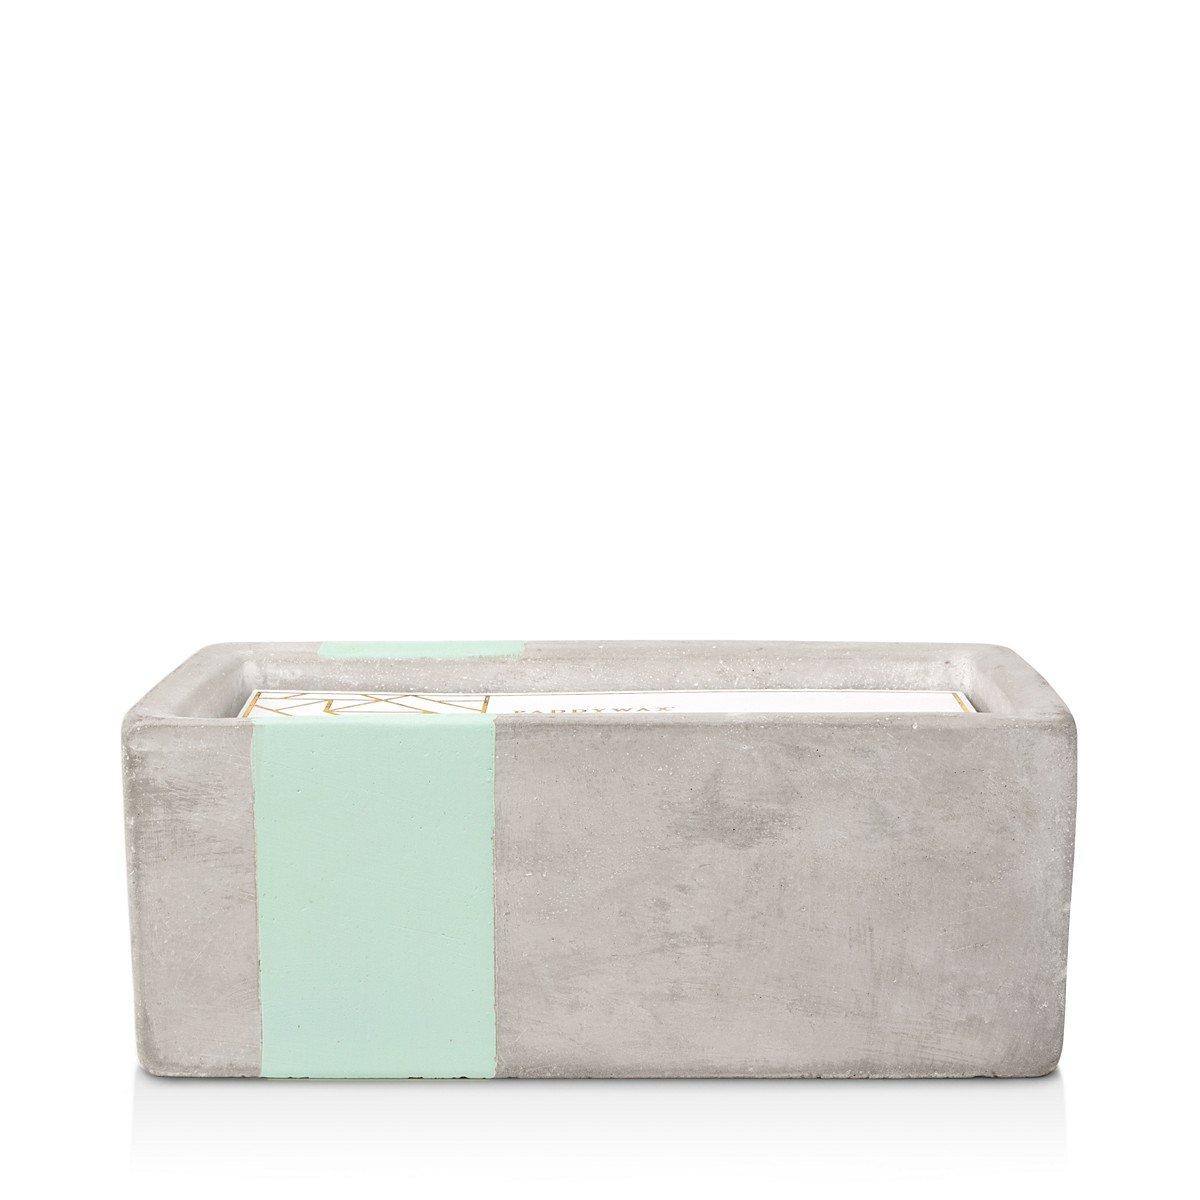 Paddywax Urban Concrete Rectangle Mint Sea Salt & Sage Candle